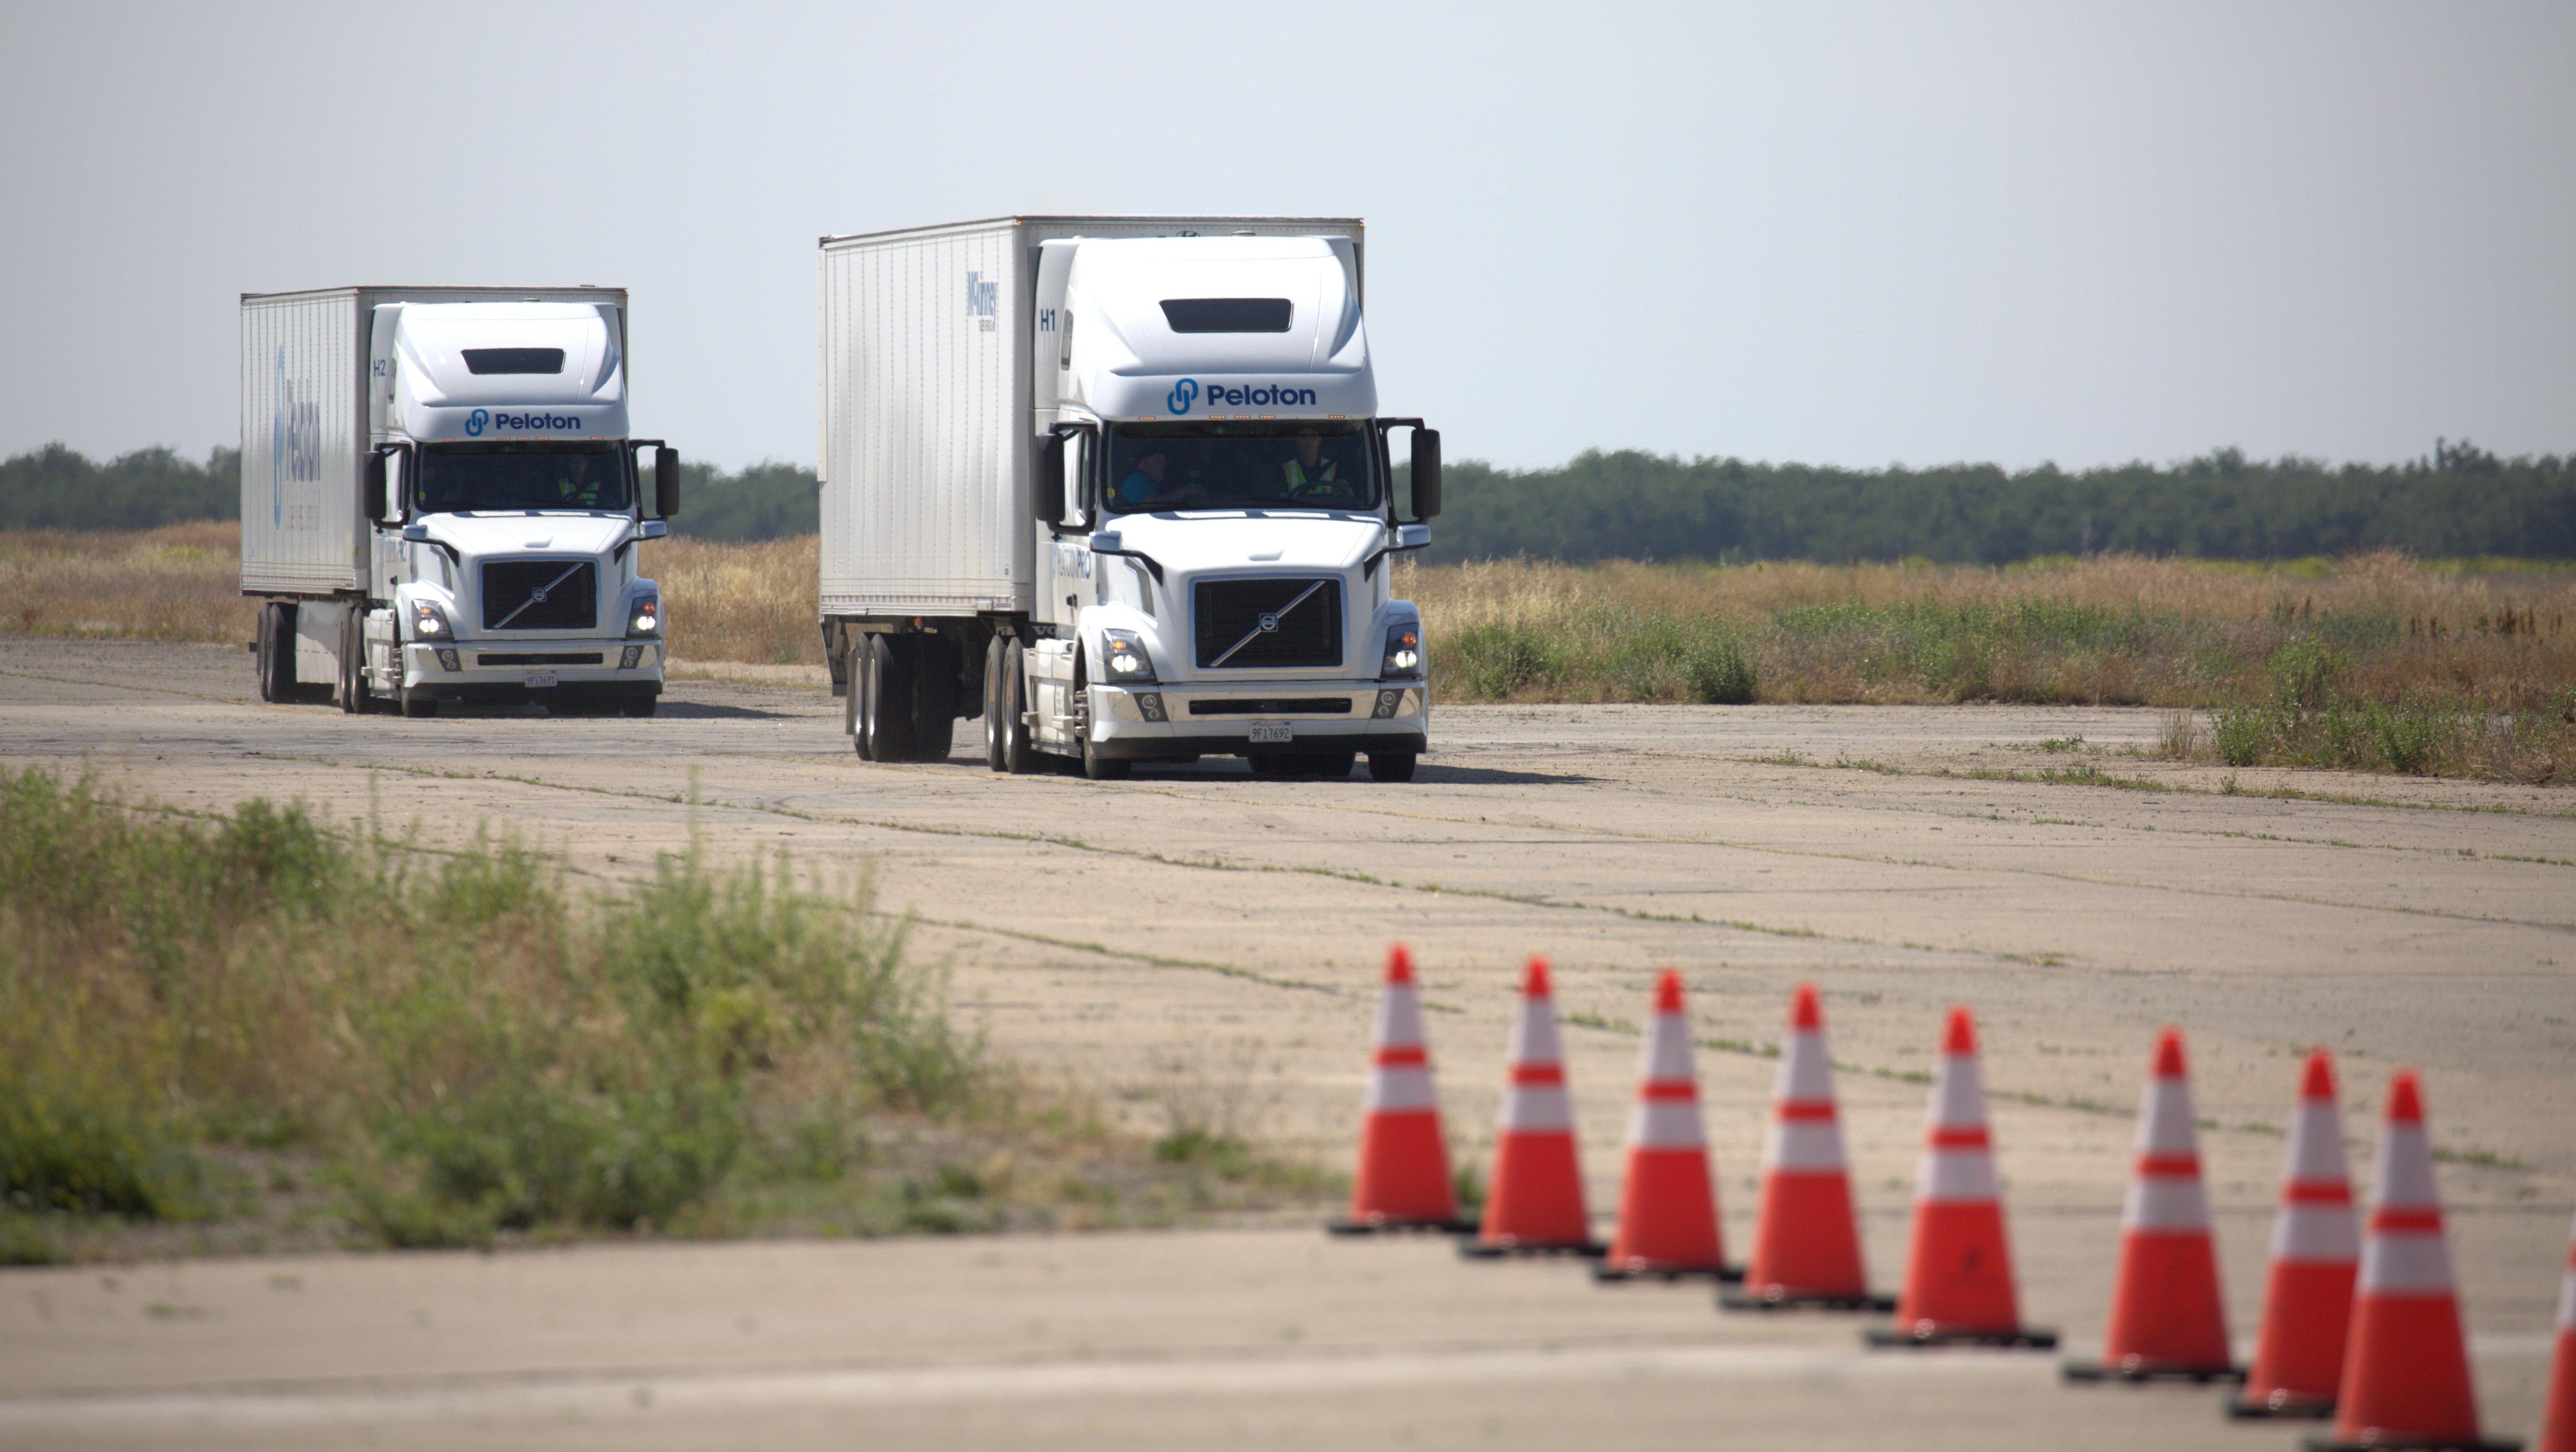 Peloton's self-driving semi truck is coming — Quartz